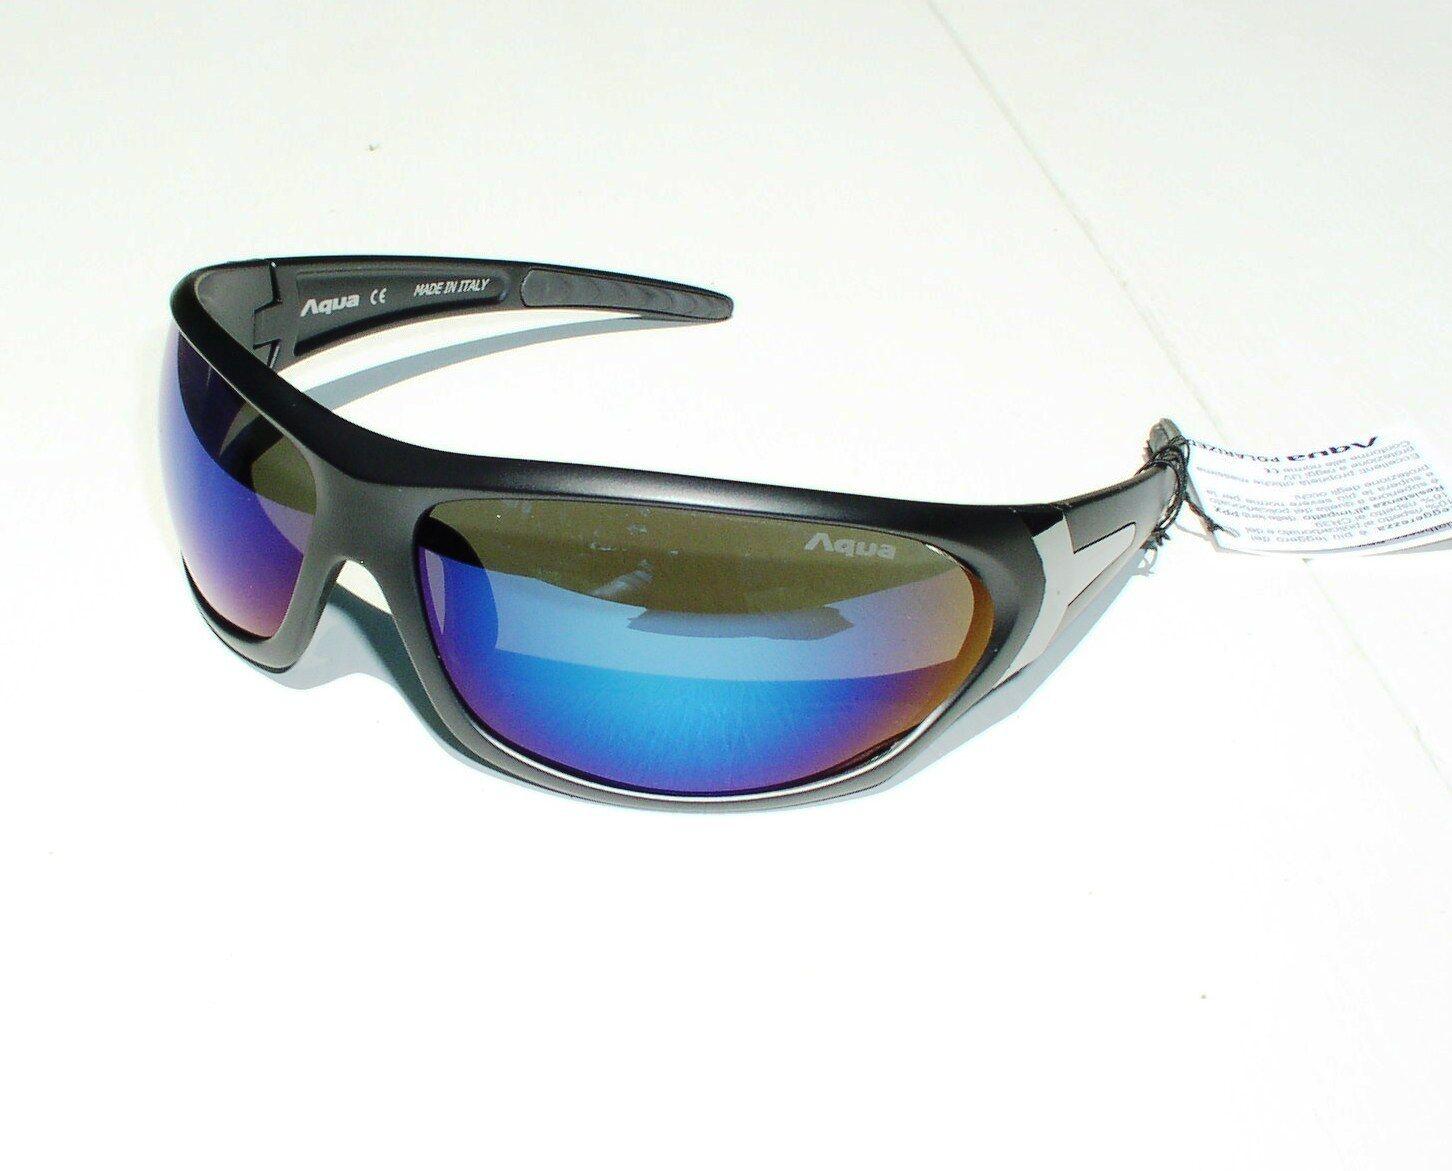 Aqua Polarisationsbrille MAKO in Dark Grey, Glasfarbe blue, Sonnenbrille